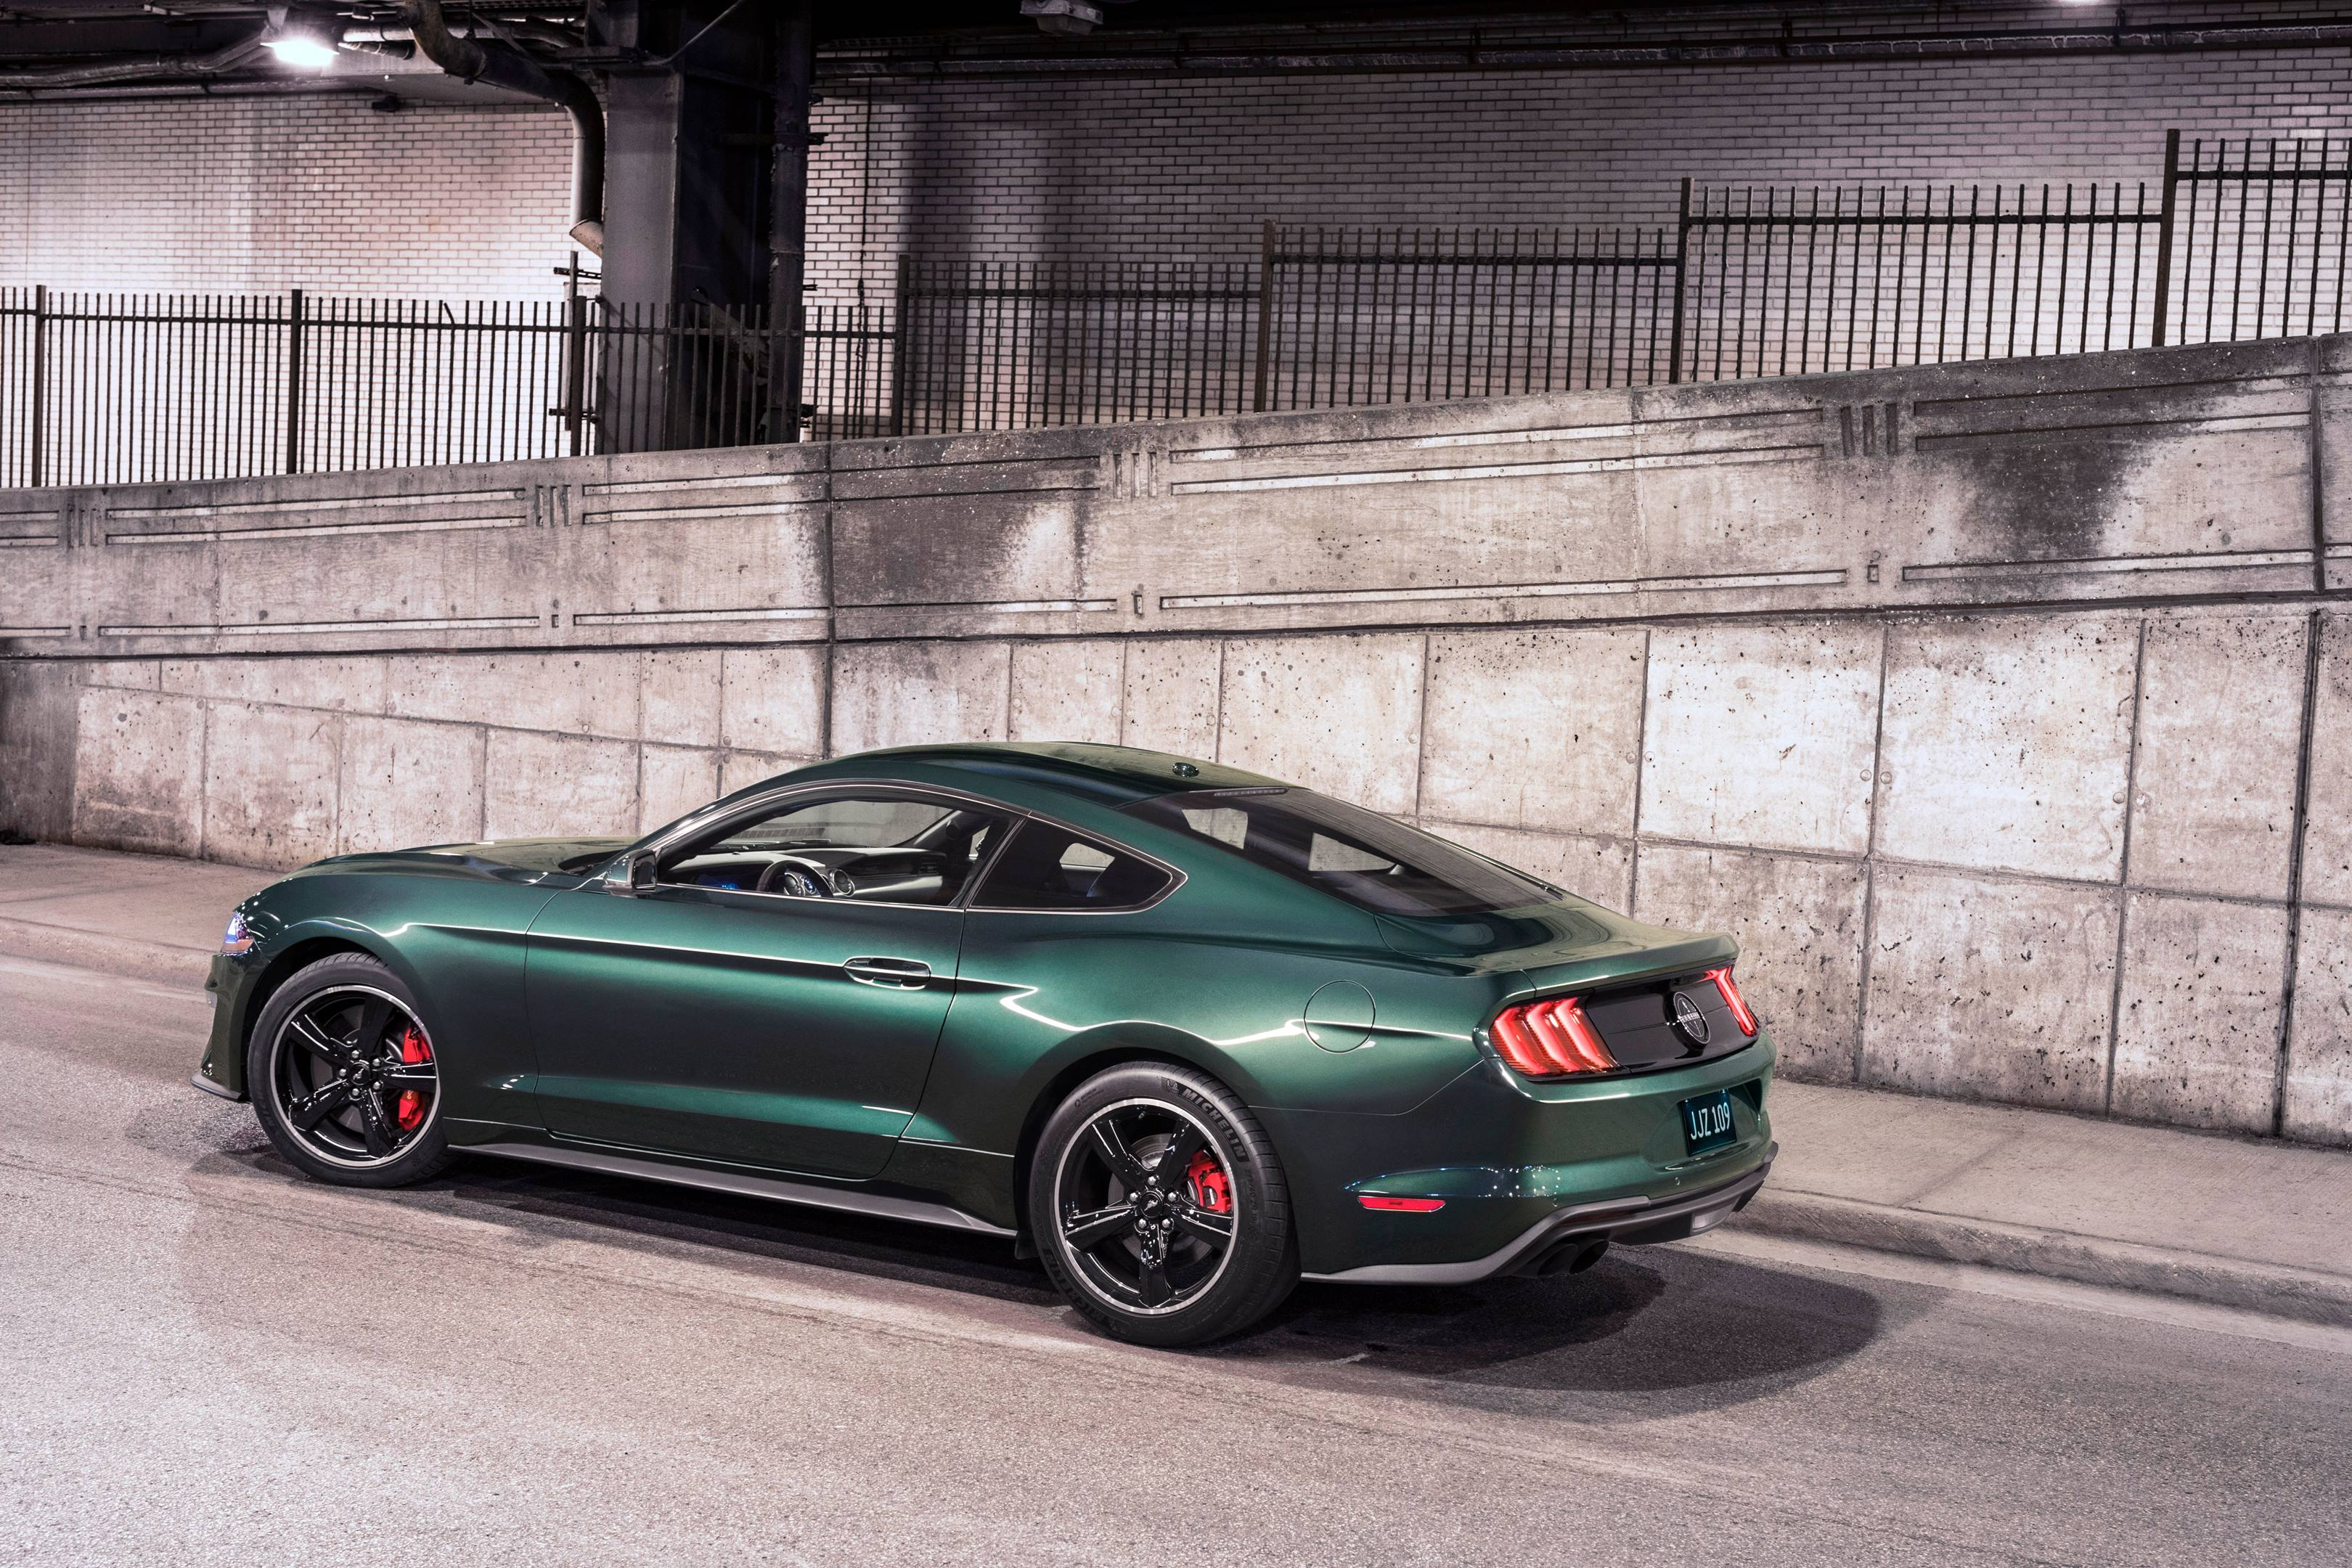 2019 Mustang Bullitt profile